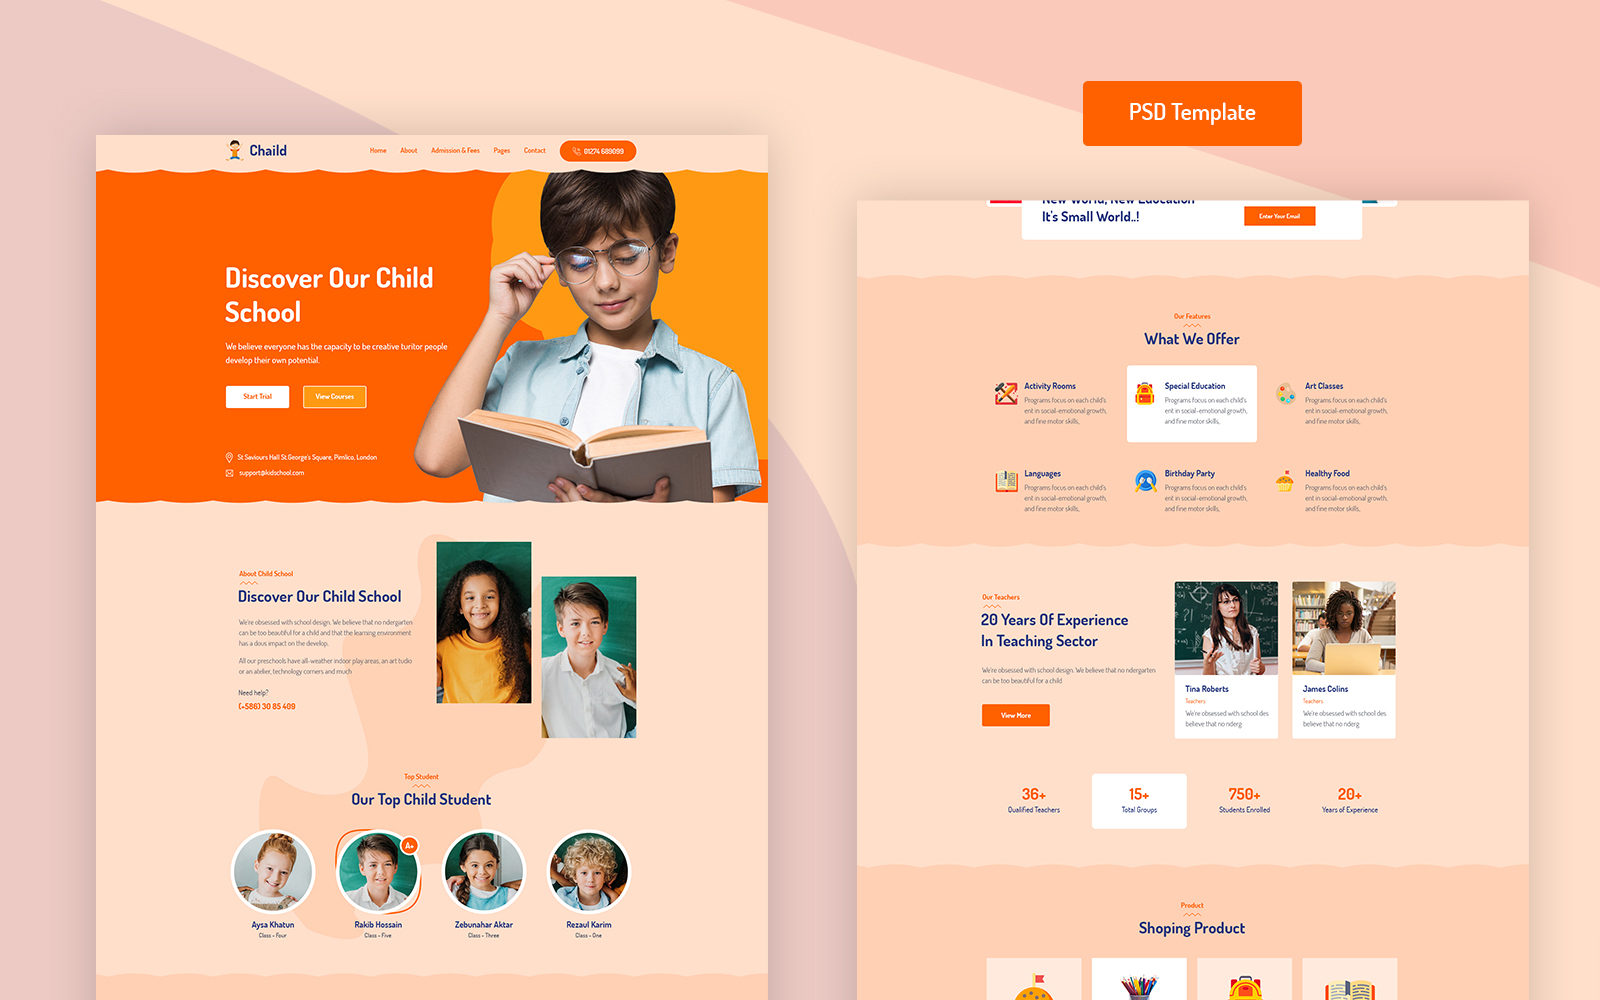 Szablon PSD Chaild - Child School Education PSD #101922